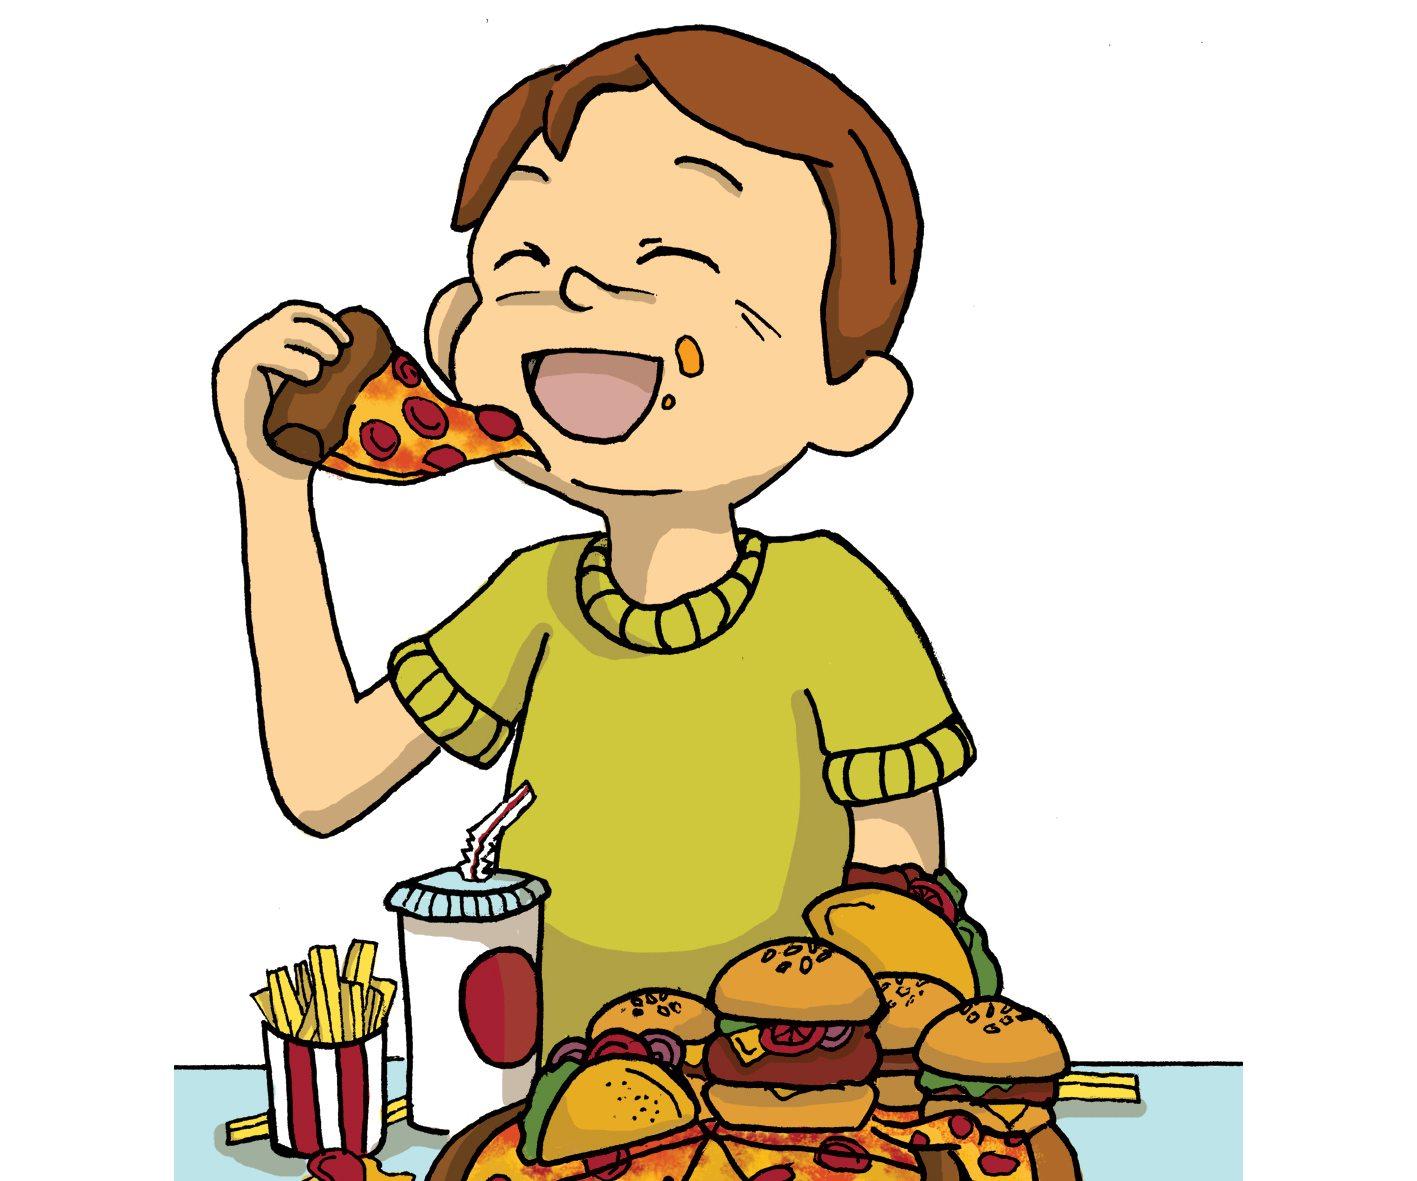 Where Kids Eat Free in Southwest Missouri